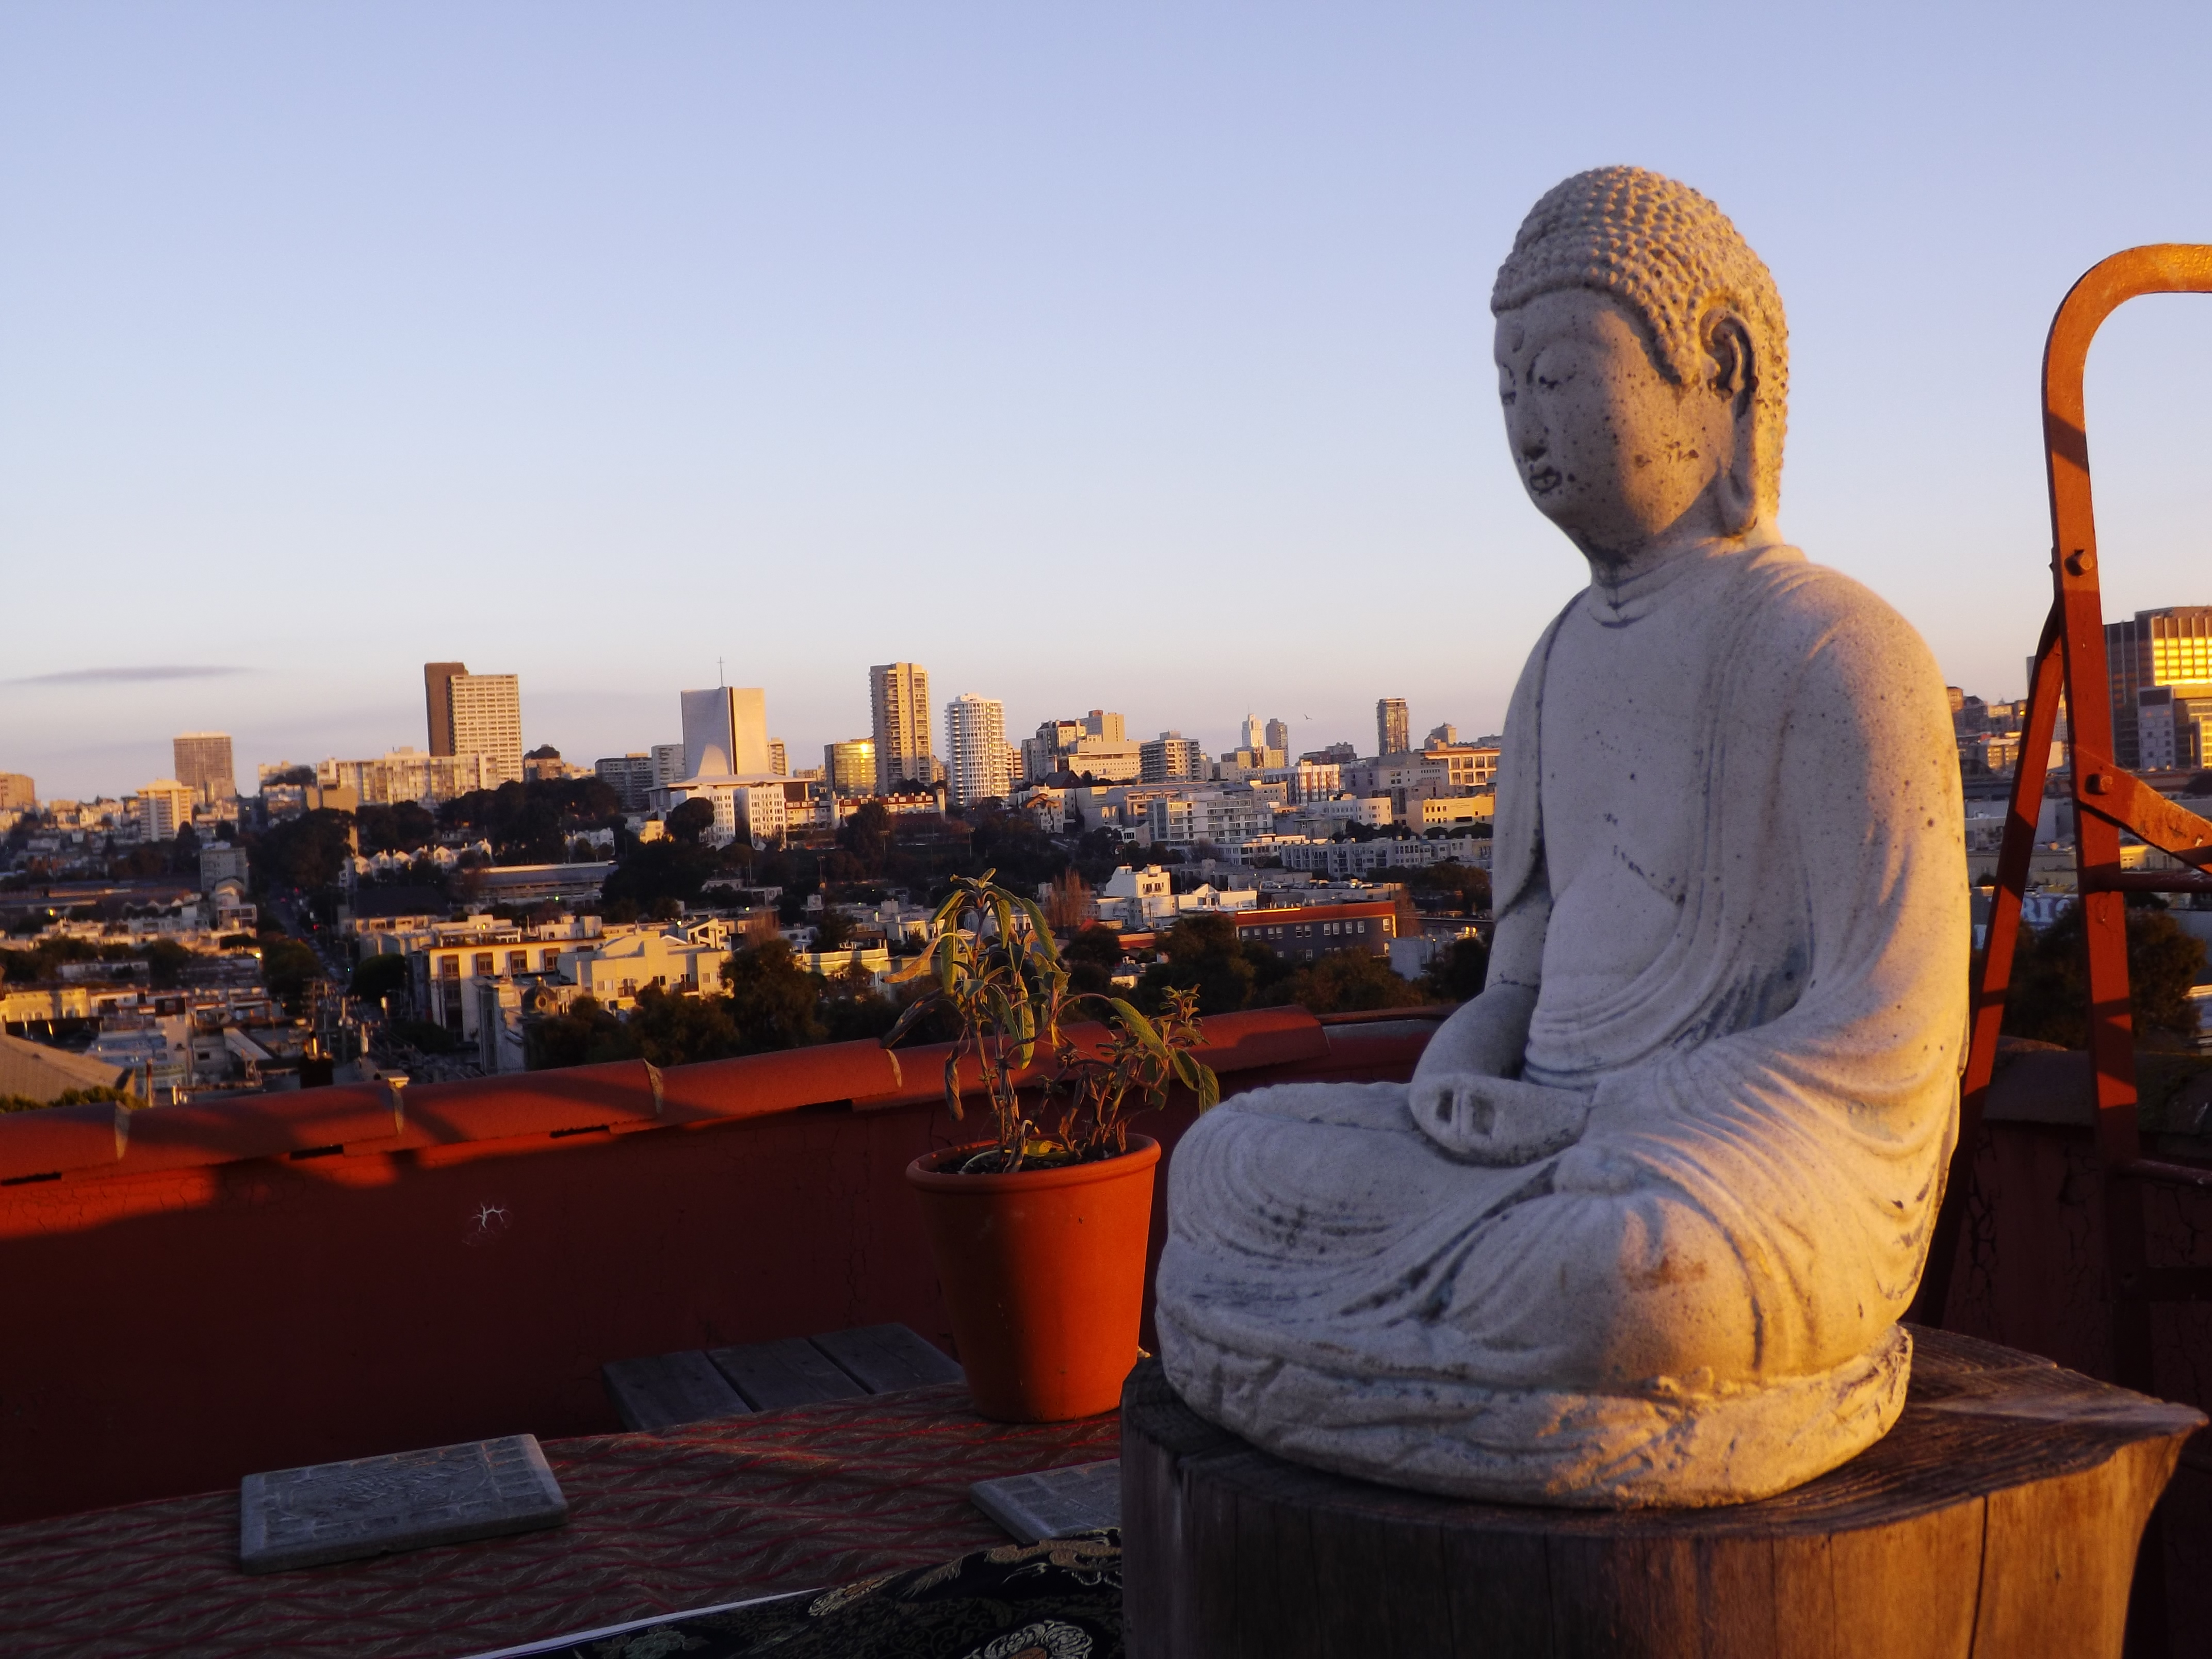 Rooftop sunrise with Buddha